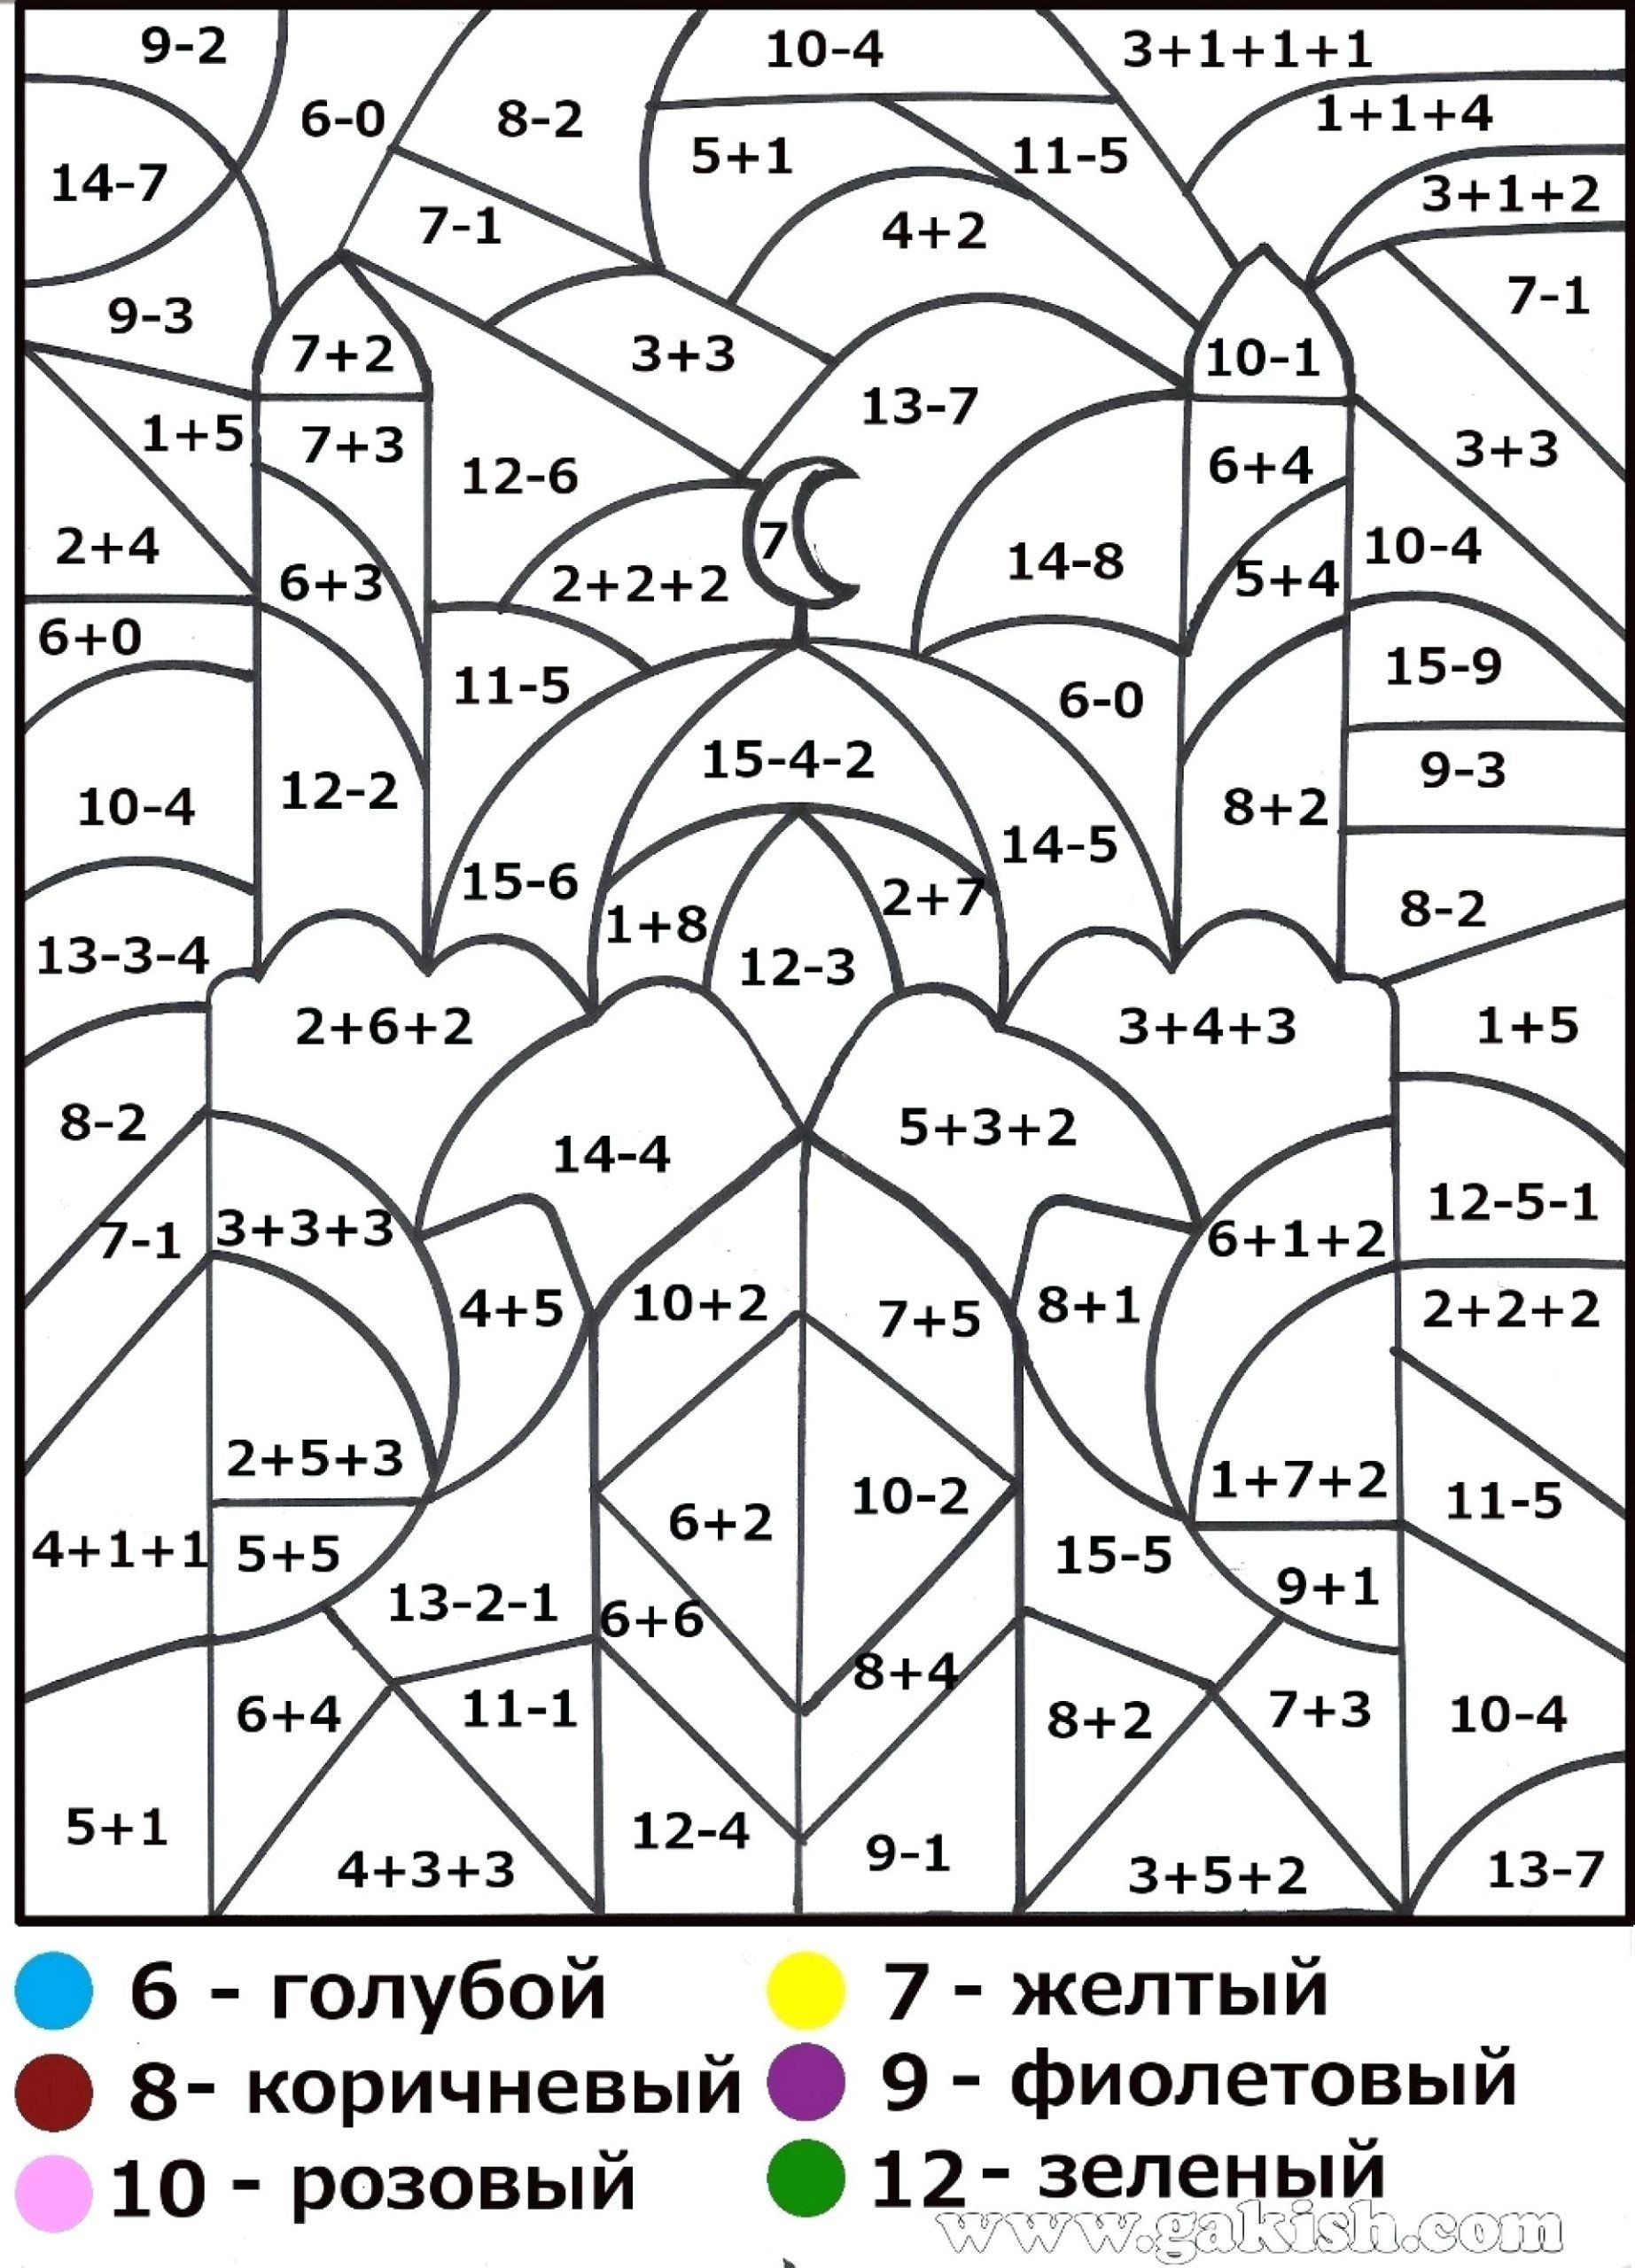 Worksheet for 5th Graders Fun Math Coloring Worksheets 5th Grade   Math  coloring worksheets [ 2560 x 1845 Pixel ]